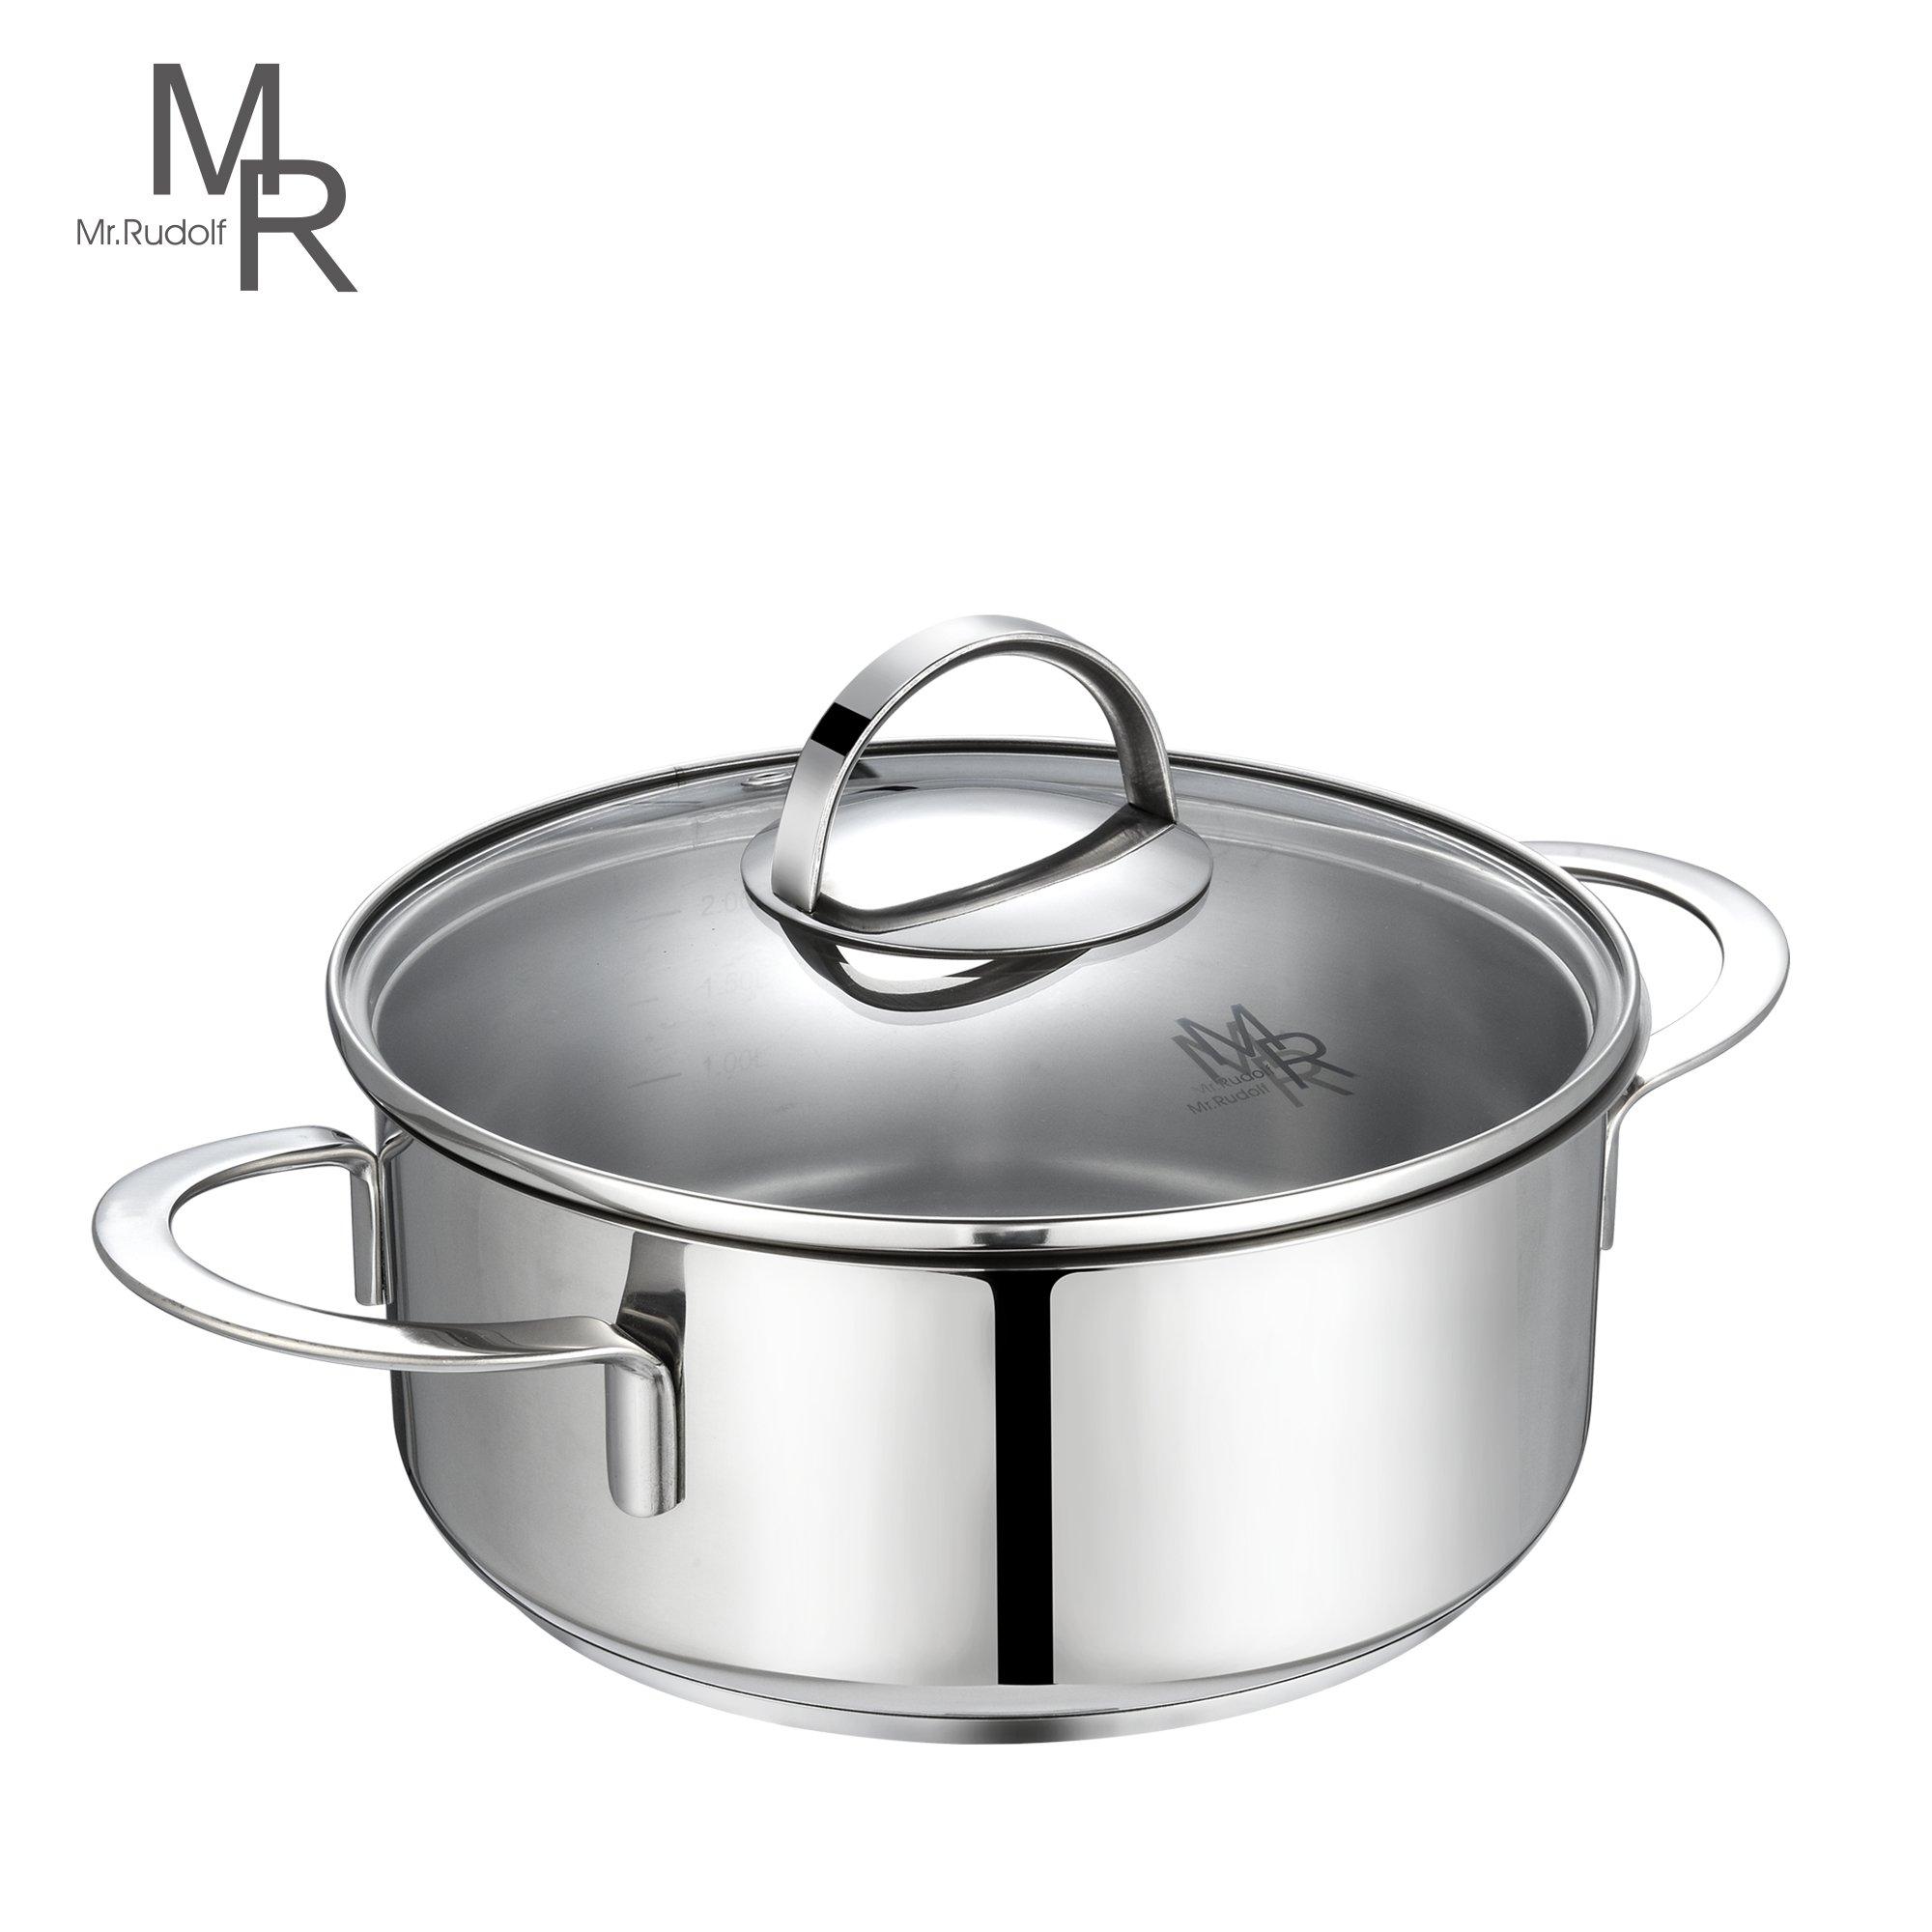 Mr. Rudolf 2 Quart Saucepan Dutch Oven 18/10 Stainless Steel 2 Handles Saucepan with Glass Lid Dishwasher Safe PFOA Free Casserole Sauce Pot 20cm 2 Liter LN-2085